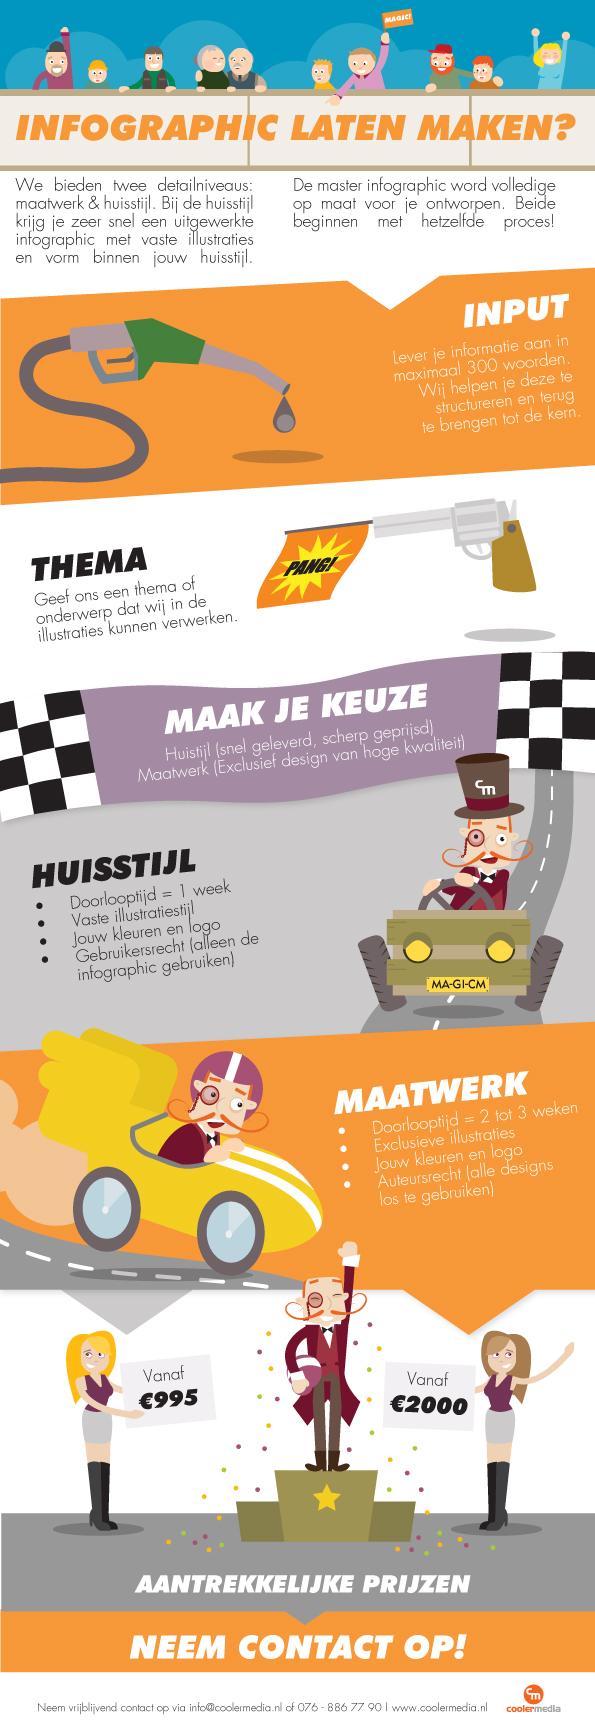 Professionele infographic